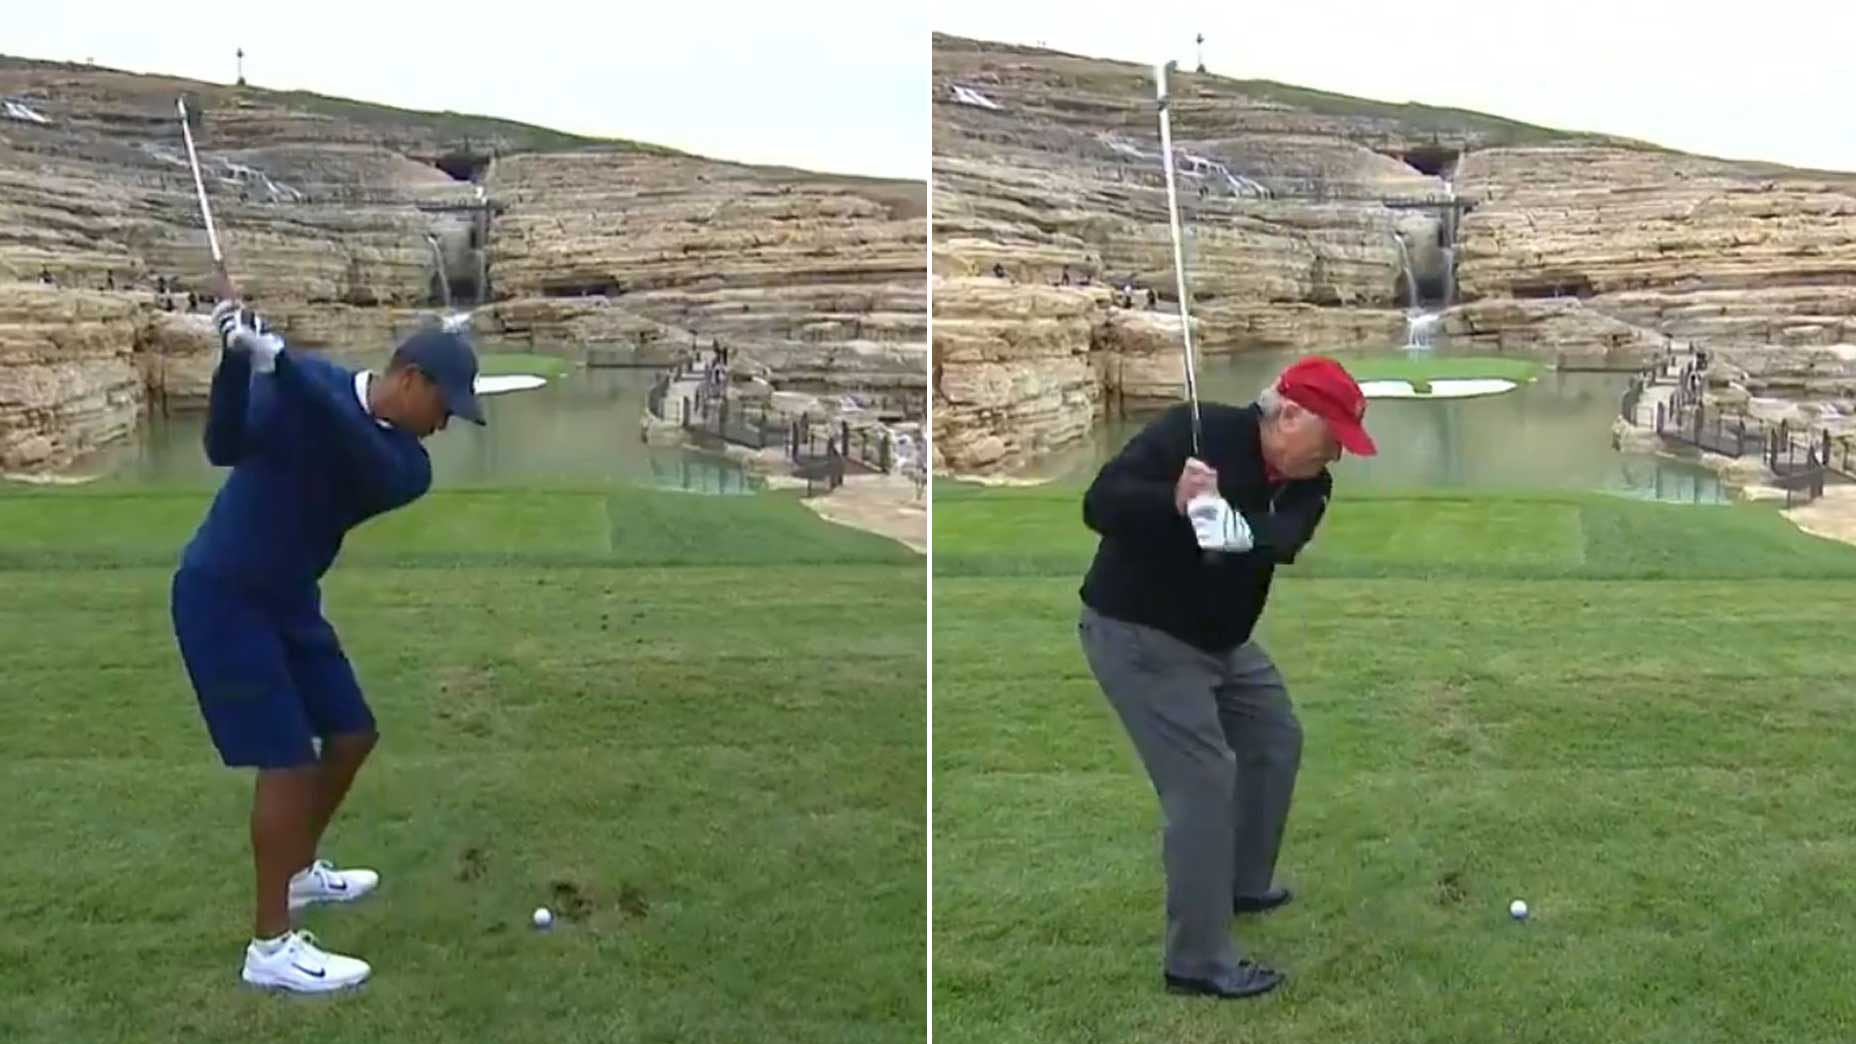 Watch Tiger Woods, Jack Nicklaus take on 19th 'bonus hole' at Payne's Valley